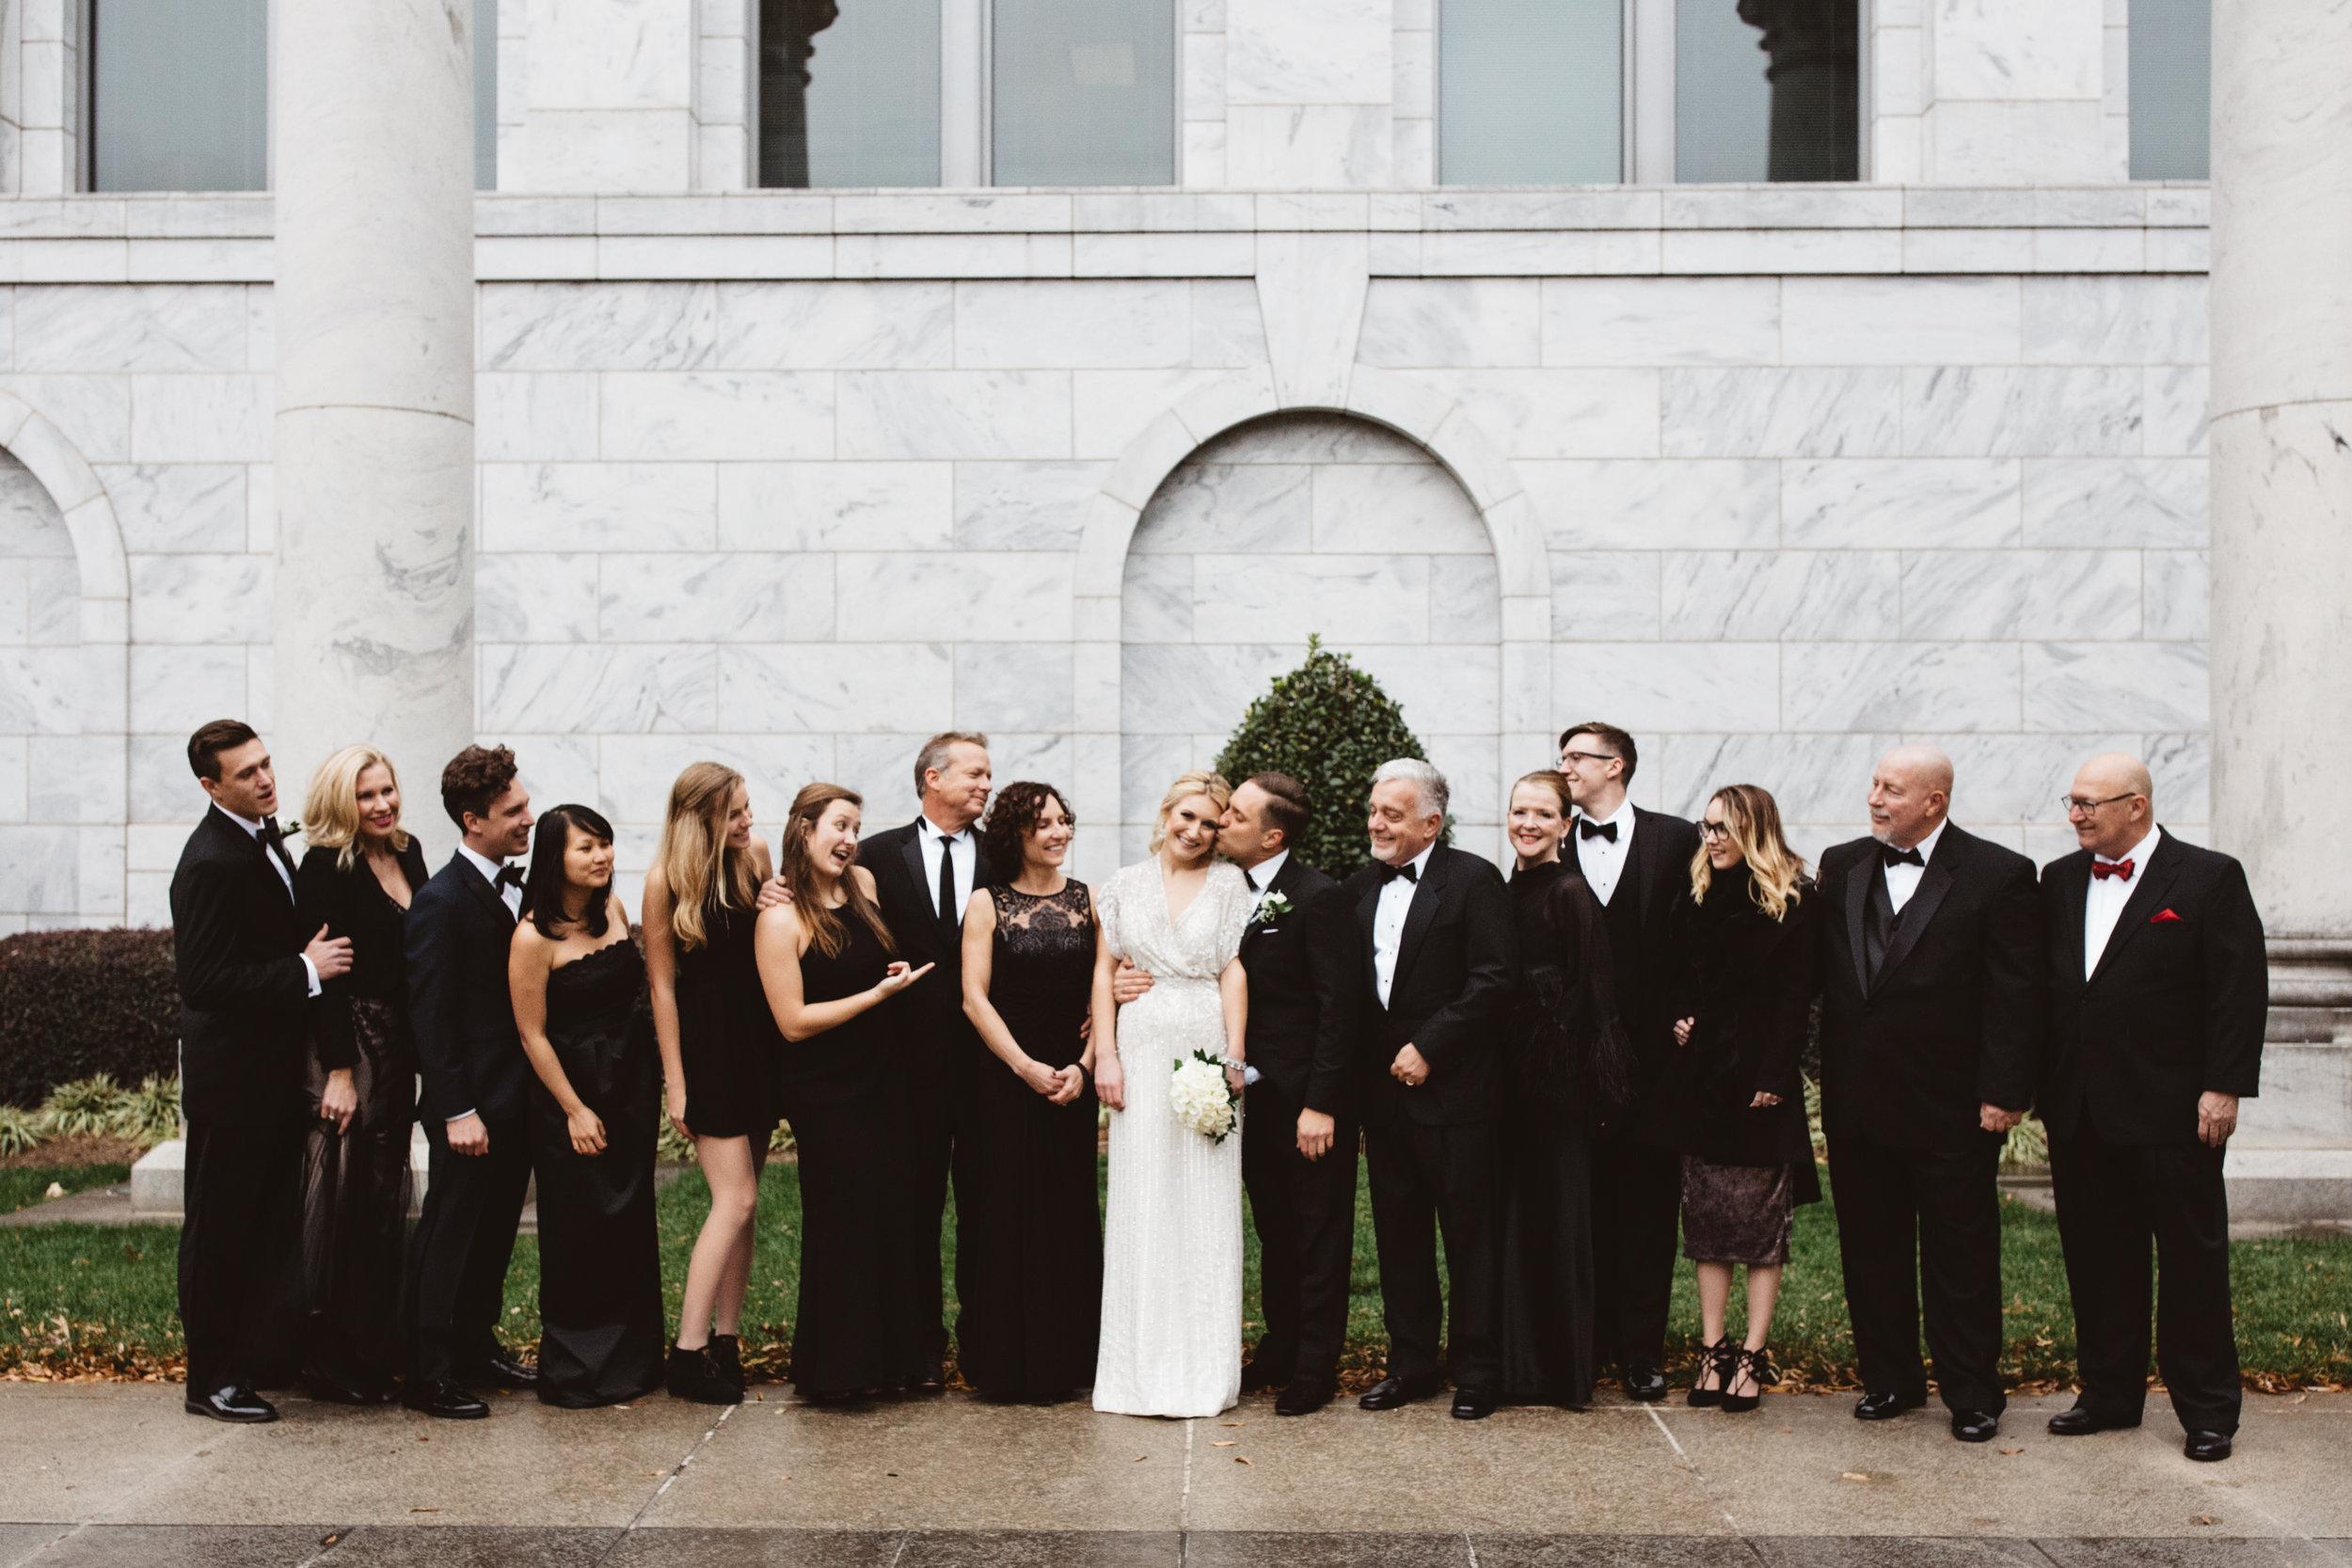 Mattie Bell Photography- Kelly & Zack Wedding Atlanta Brewery -188.jpg